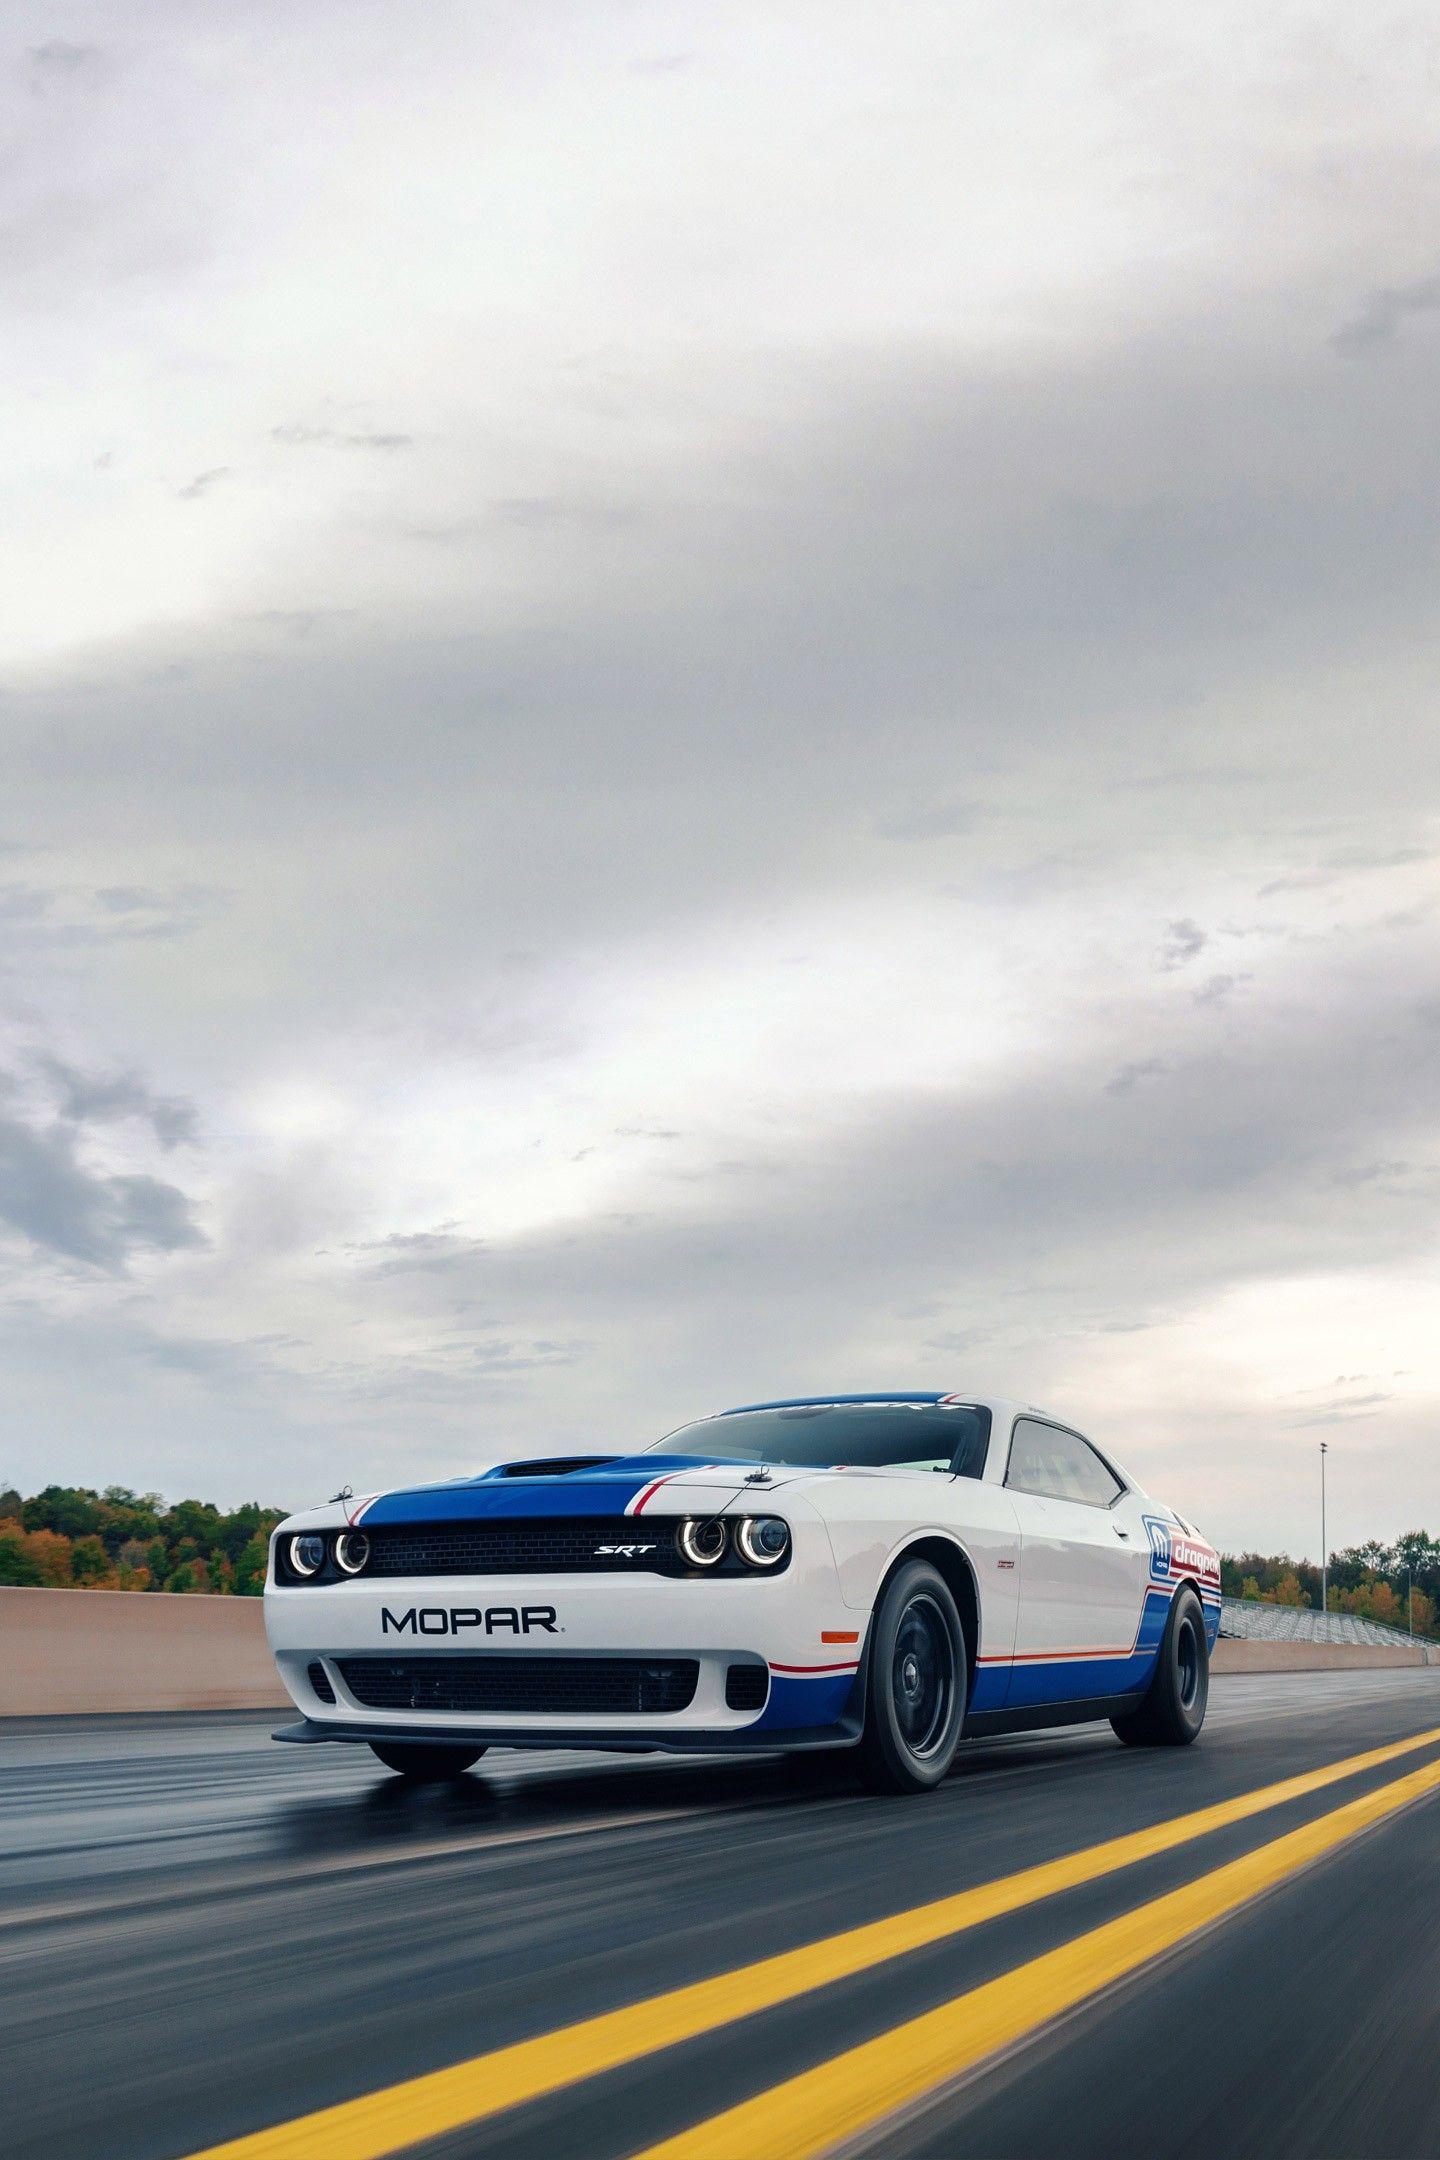 470+Dodge Challenger Full HD Wallpapers 1440X2160